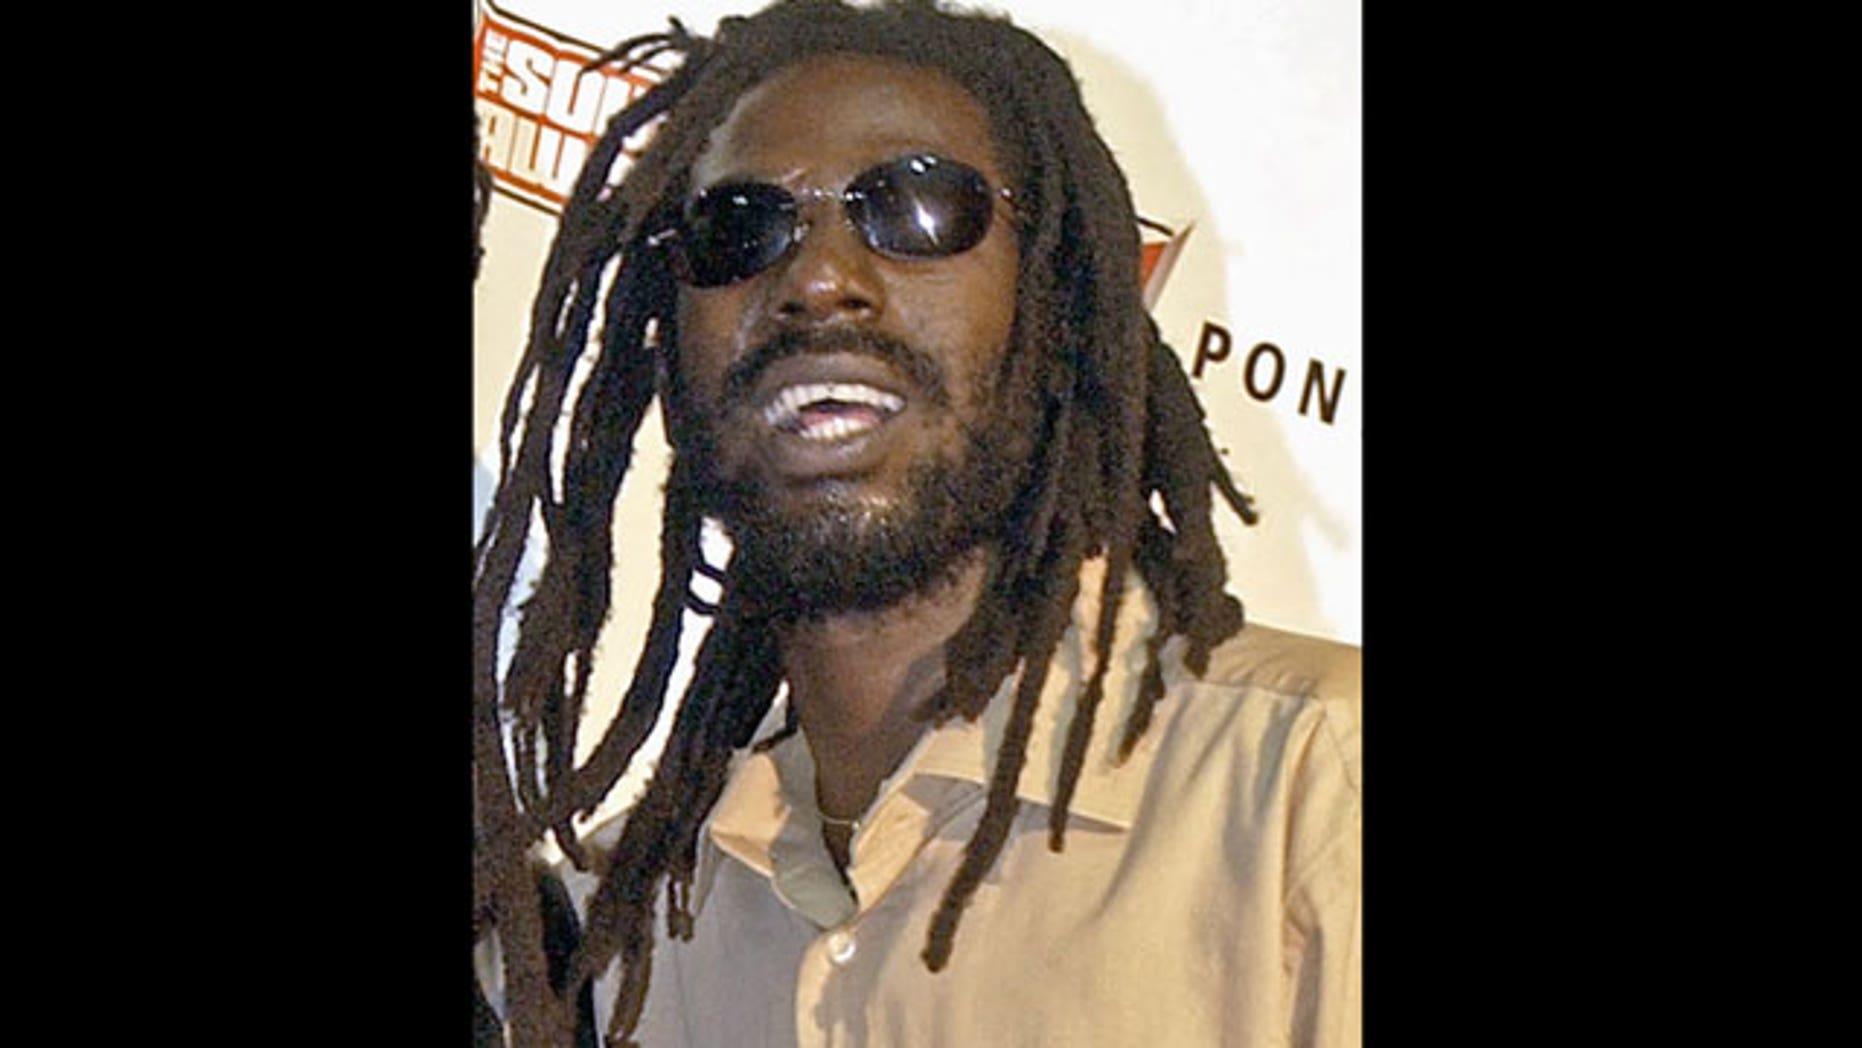 Singer Buju Banton is facing a life sentence if convicted.